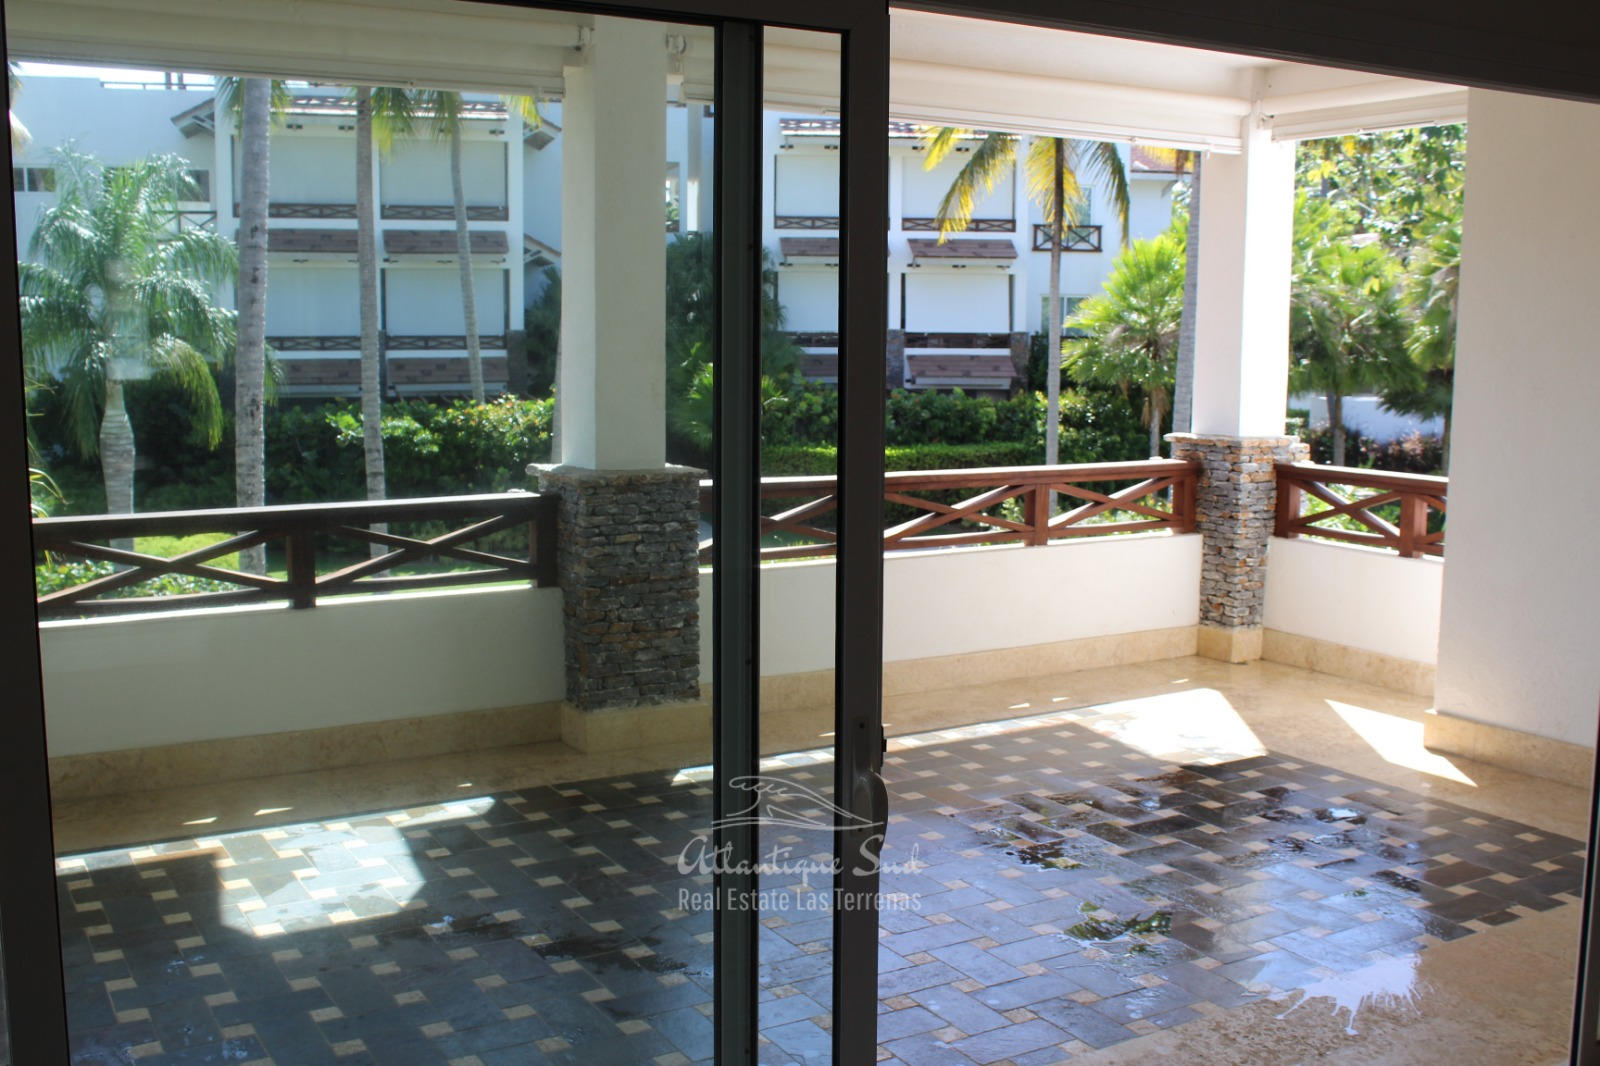 Apartments near the beach real estate las terrenas dominican republic 31 (20).jpg